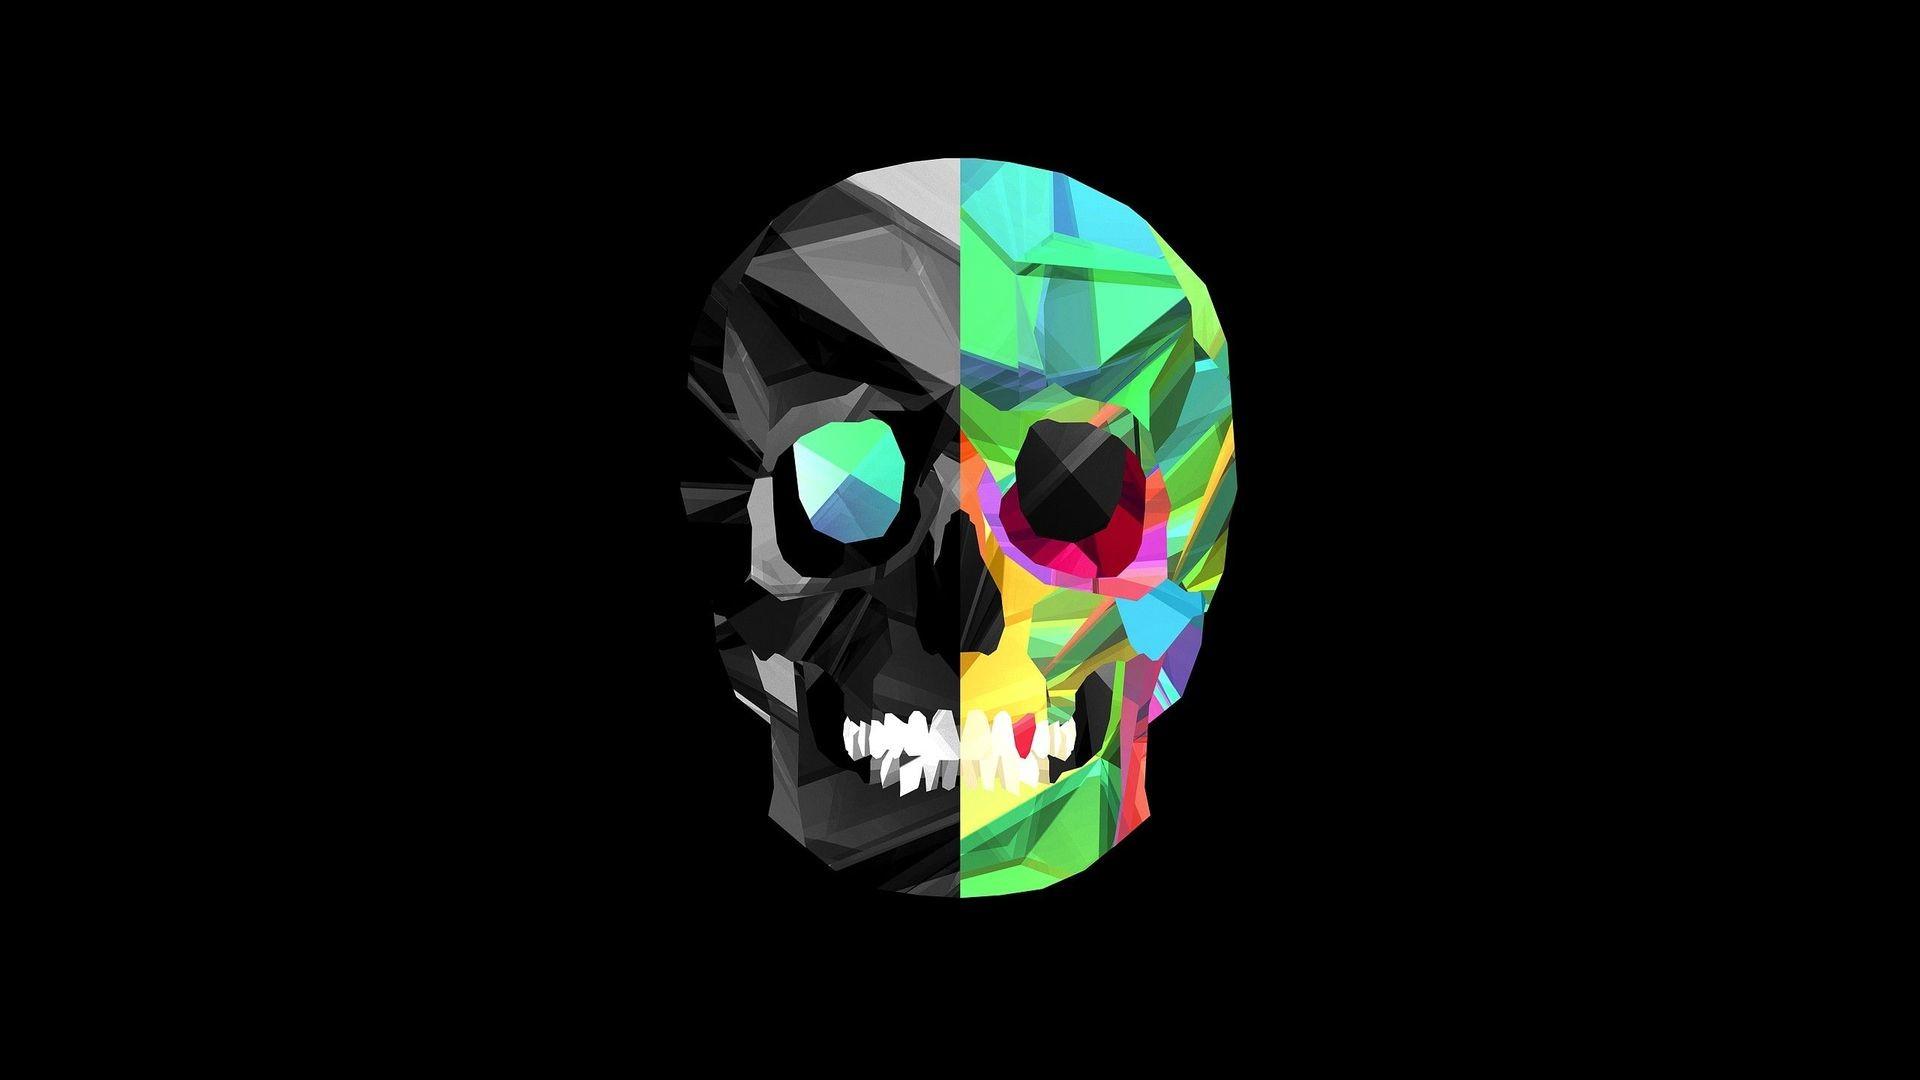 1920x1080 0 Skull Wallpaper Free Download Skull Wallpaper Free Download